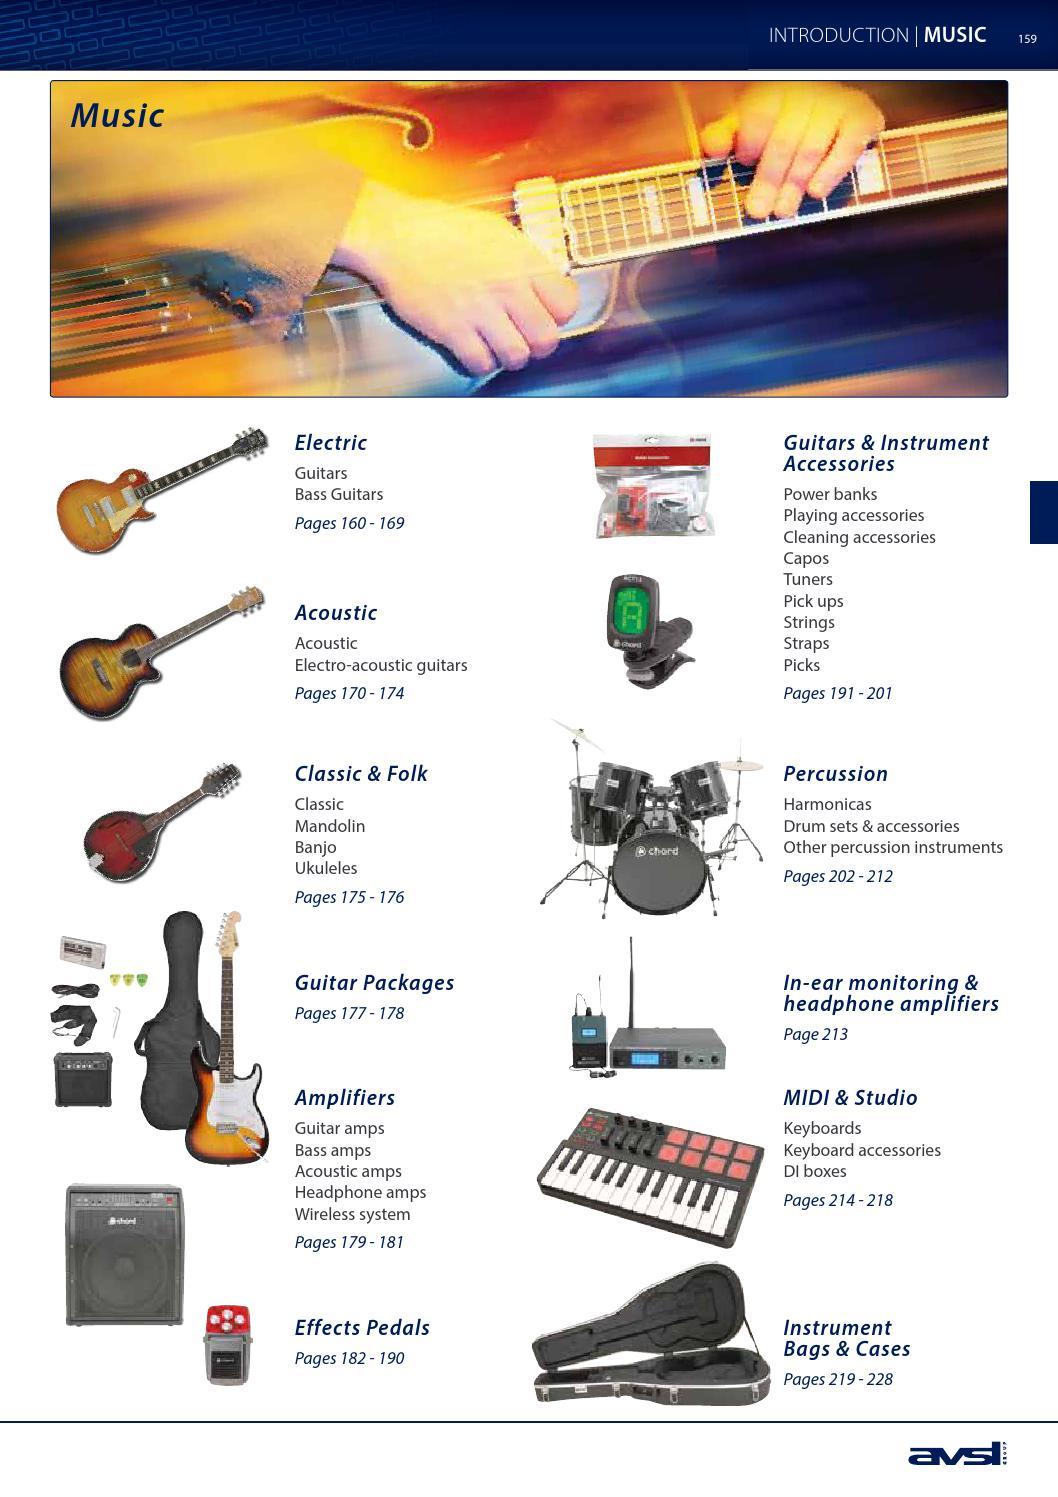 201401 v14section07 by AVSL Group Ltd - issuu